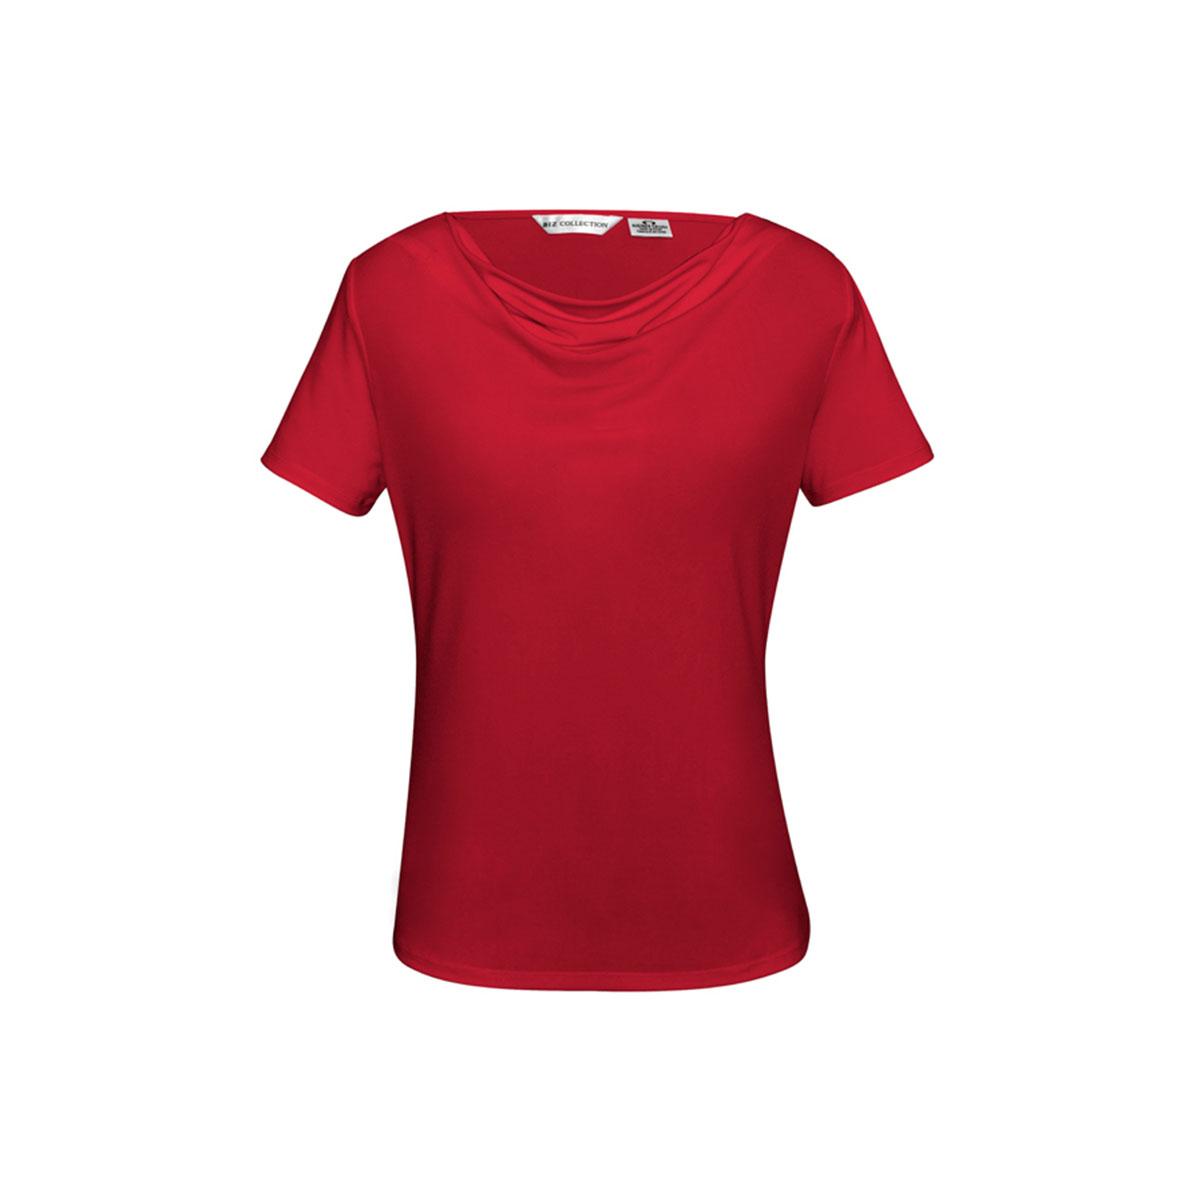 Ladies Ava Drape Knit Top-Red